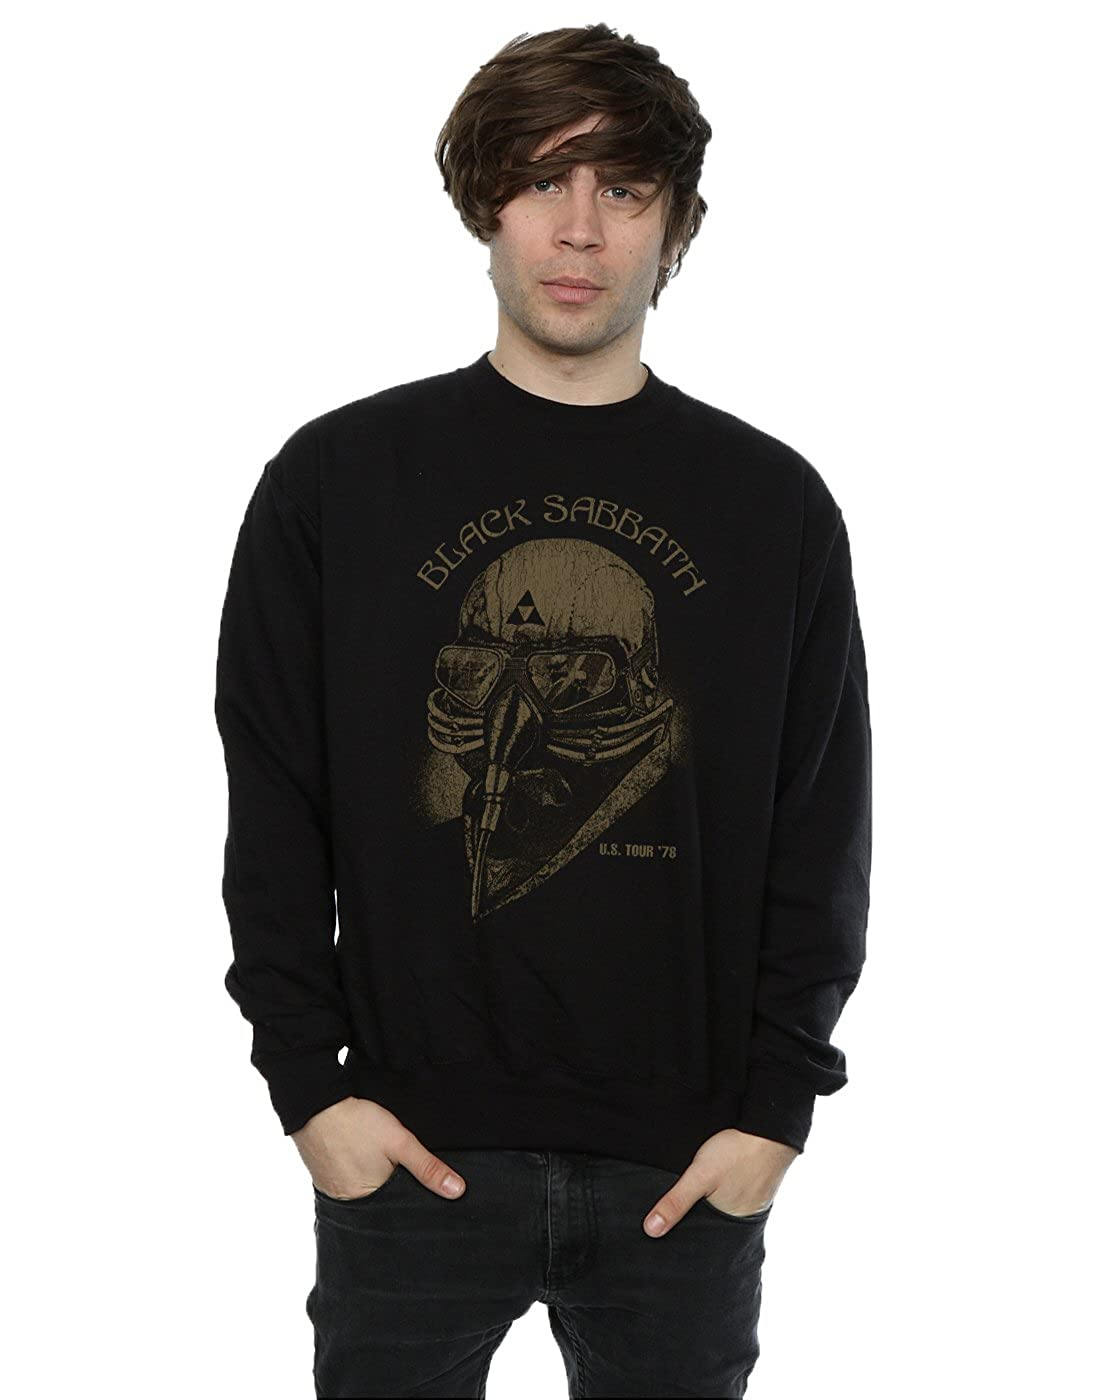 Schwarz Sabbath Herren Tour 78 Sweatshirt